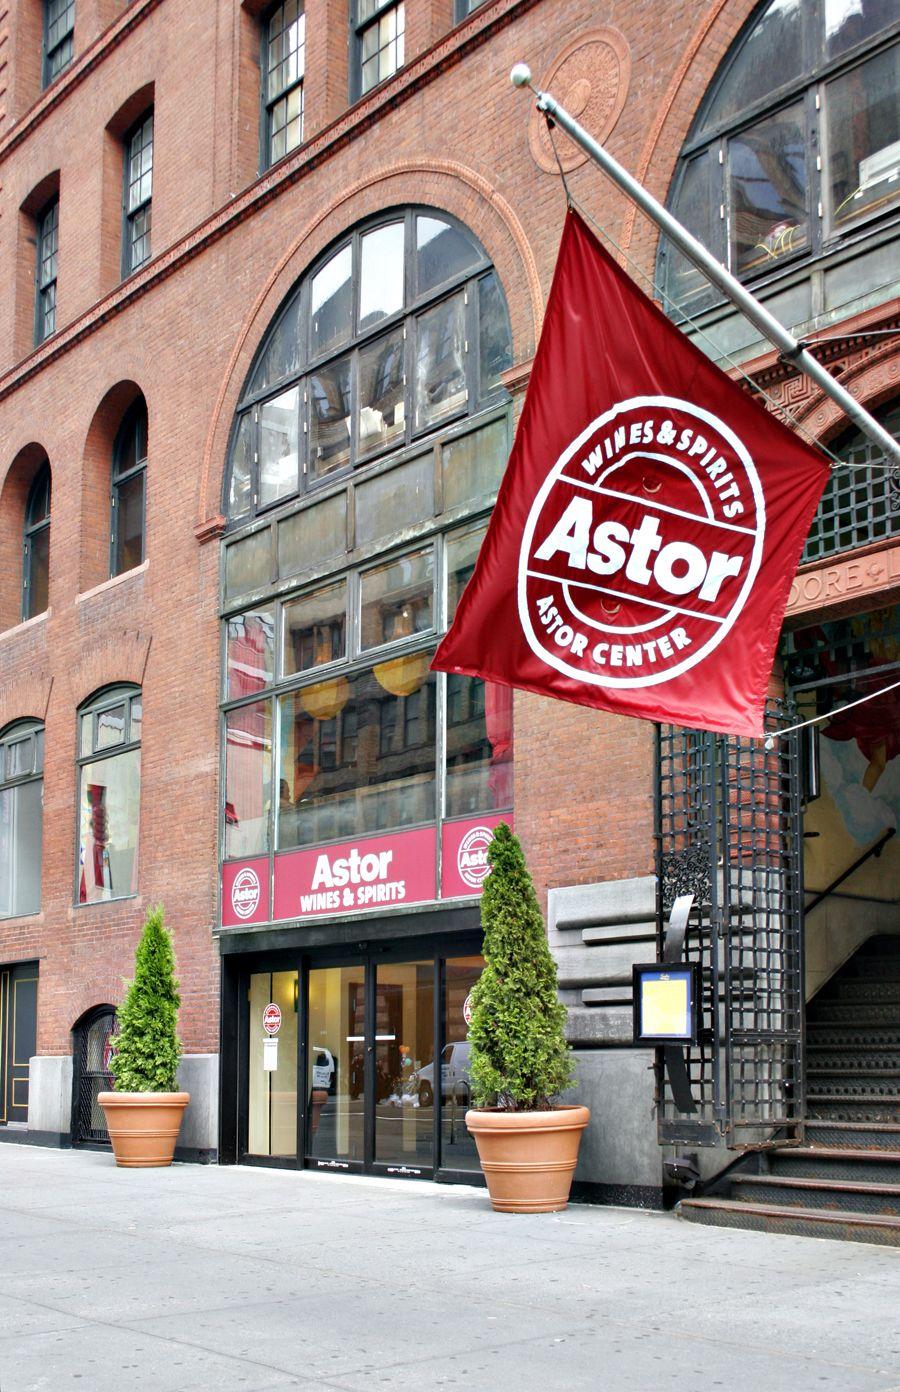 Astor Wines Spirits Wines Wine Subscription Wine Discount